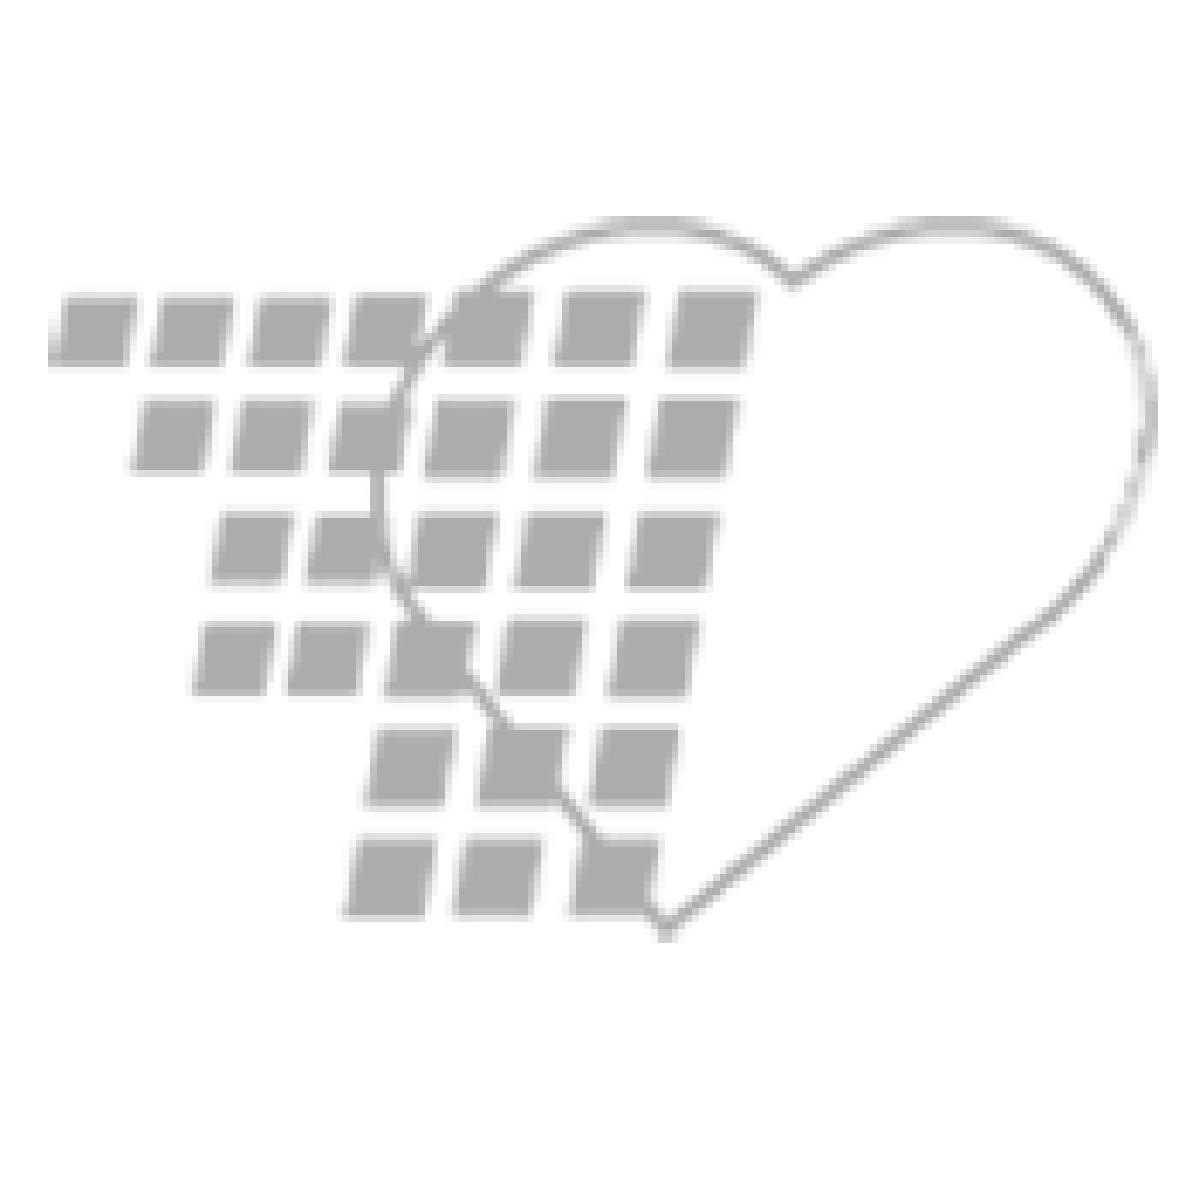 02-43-5176 Pocket Nurse® 12 Channel ECG Educator Package with Interpretation